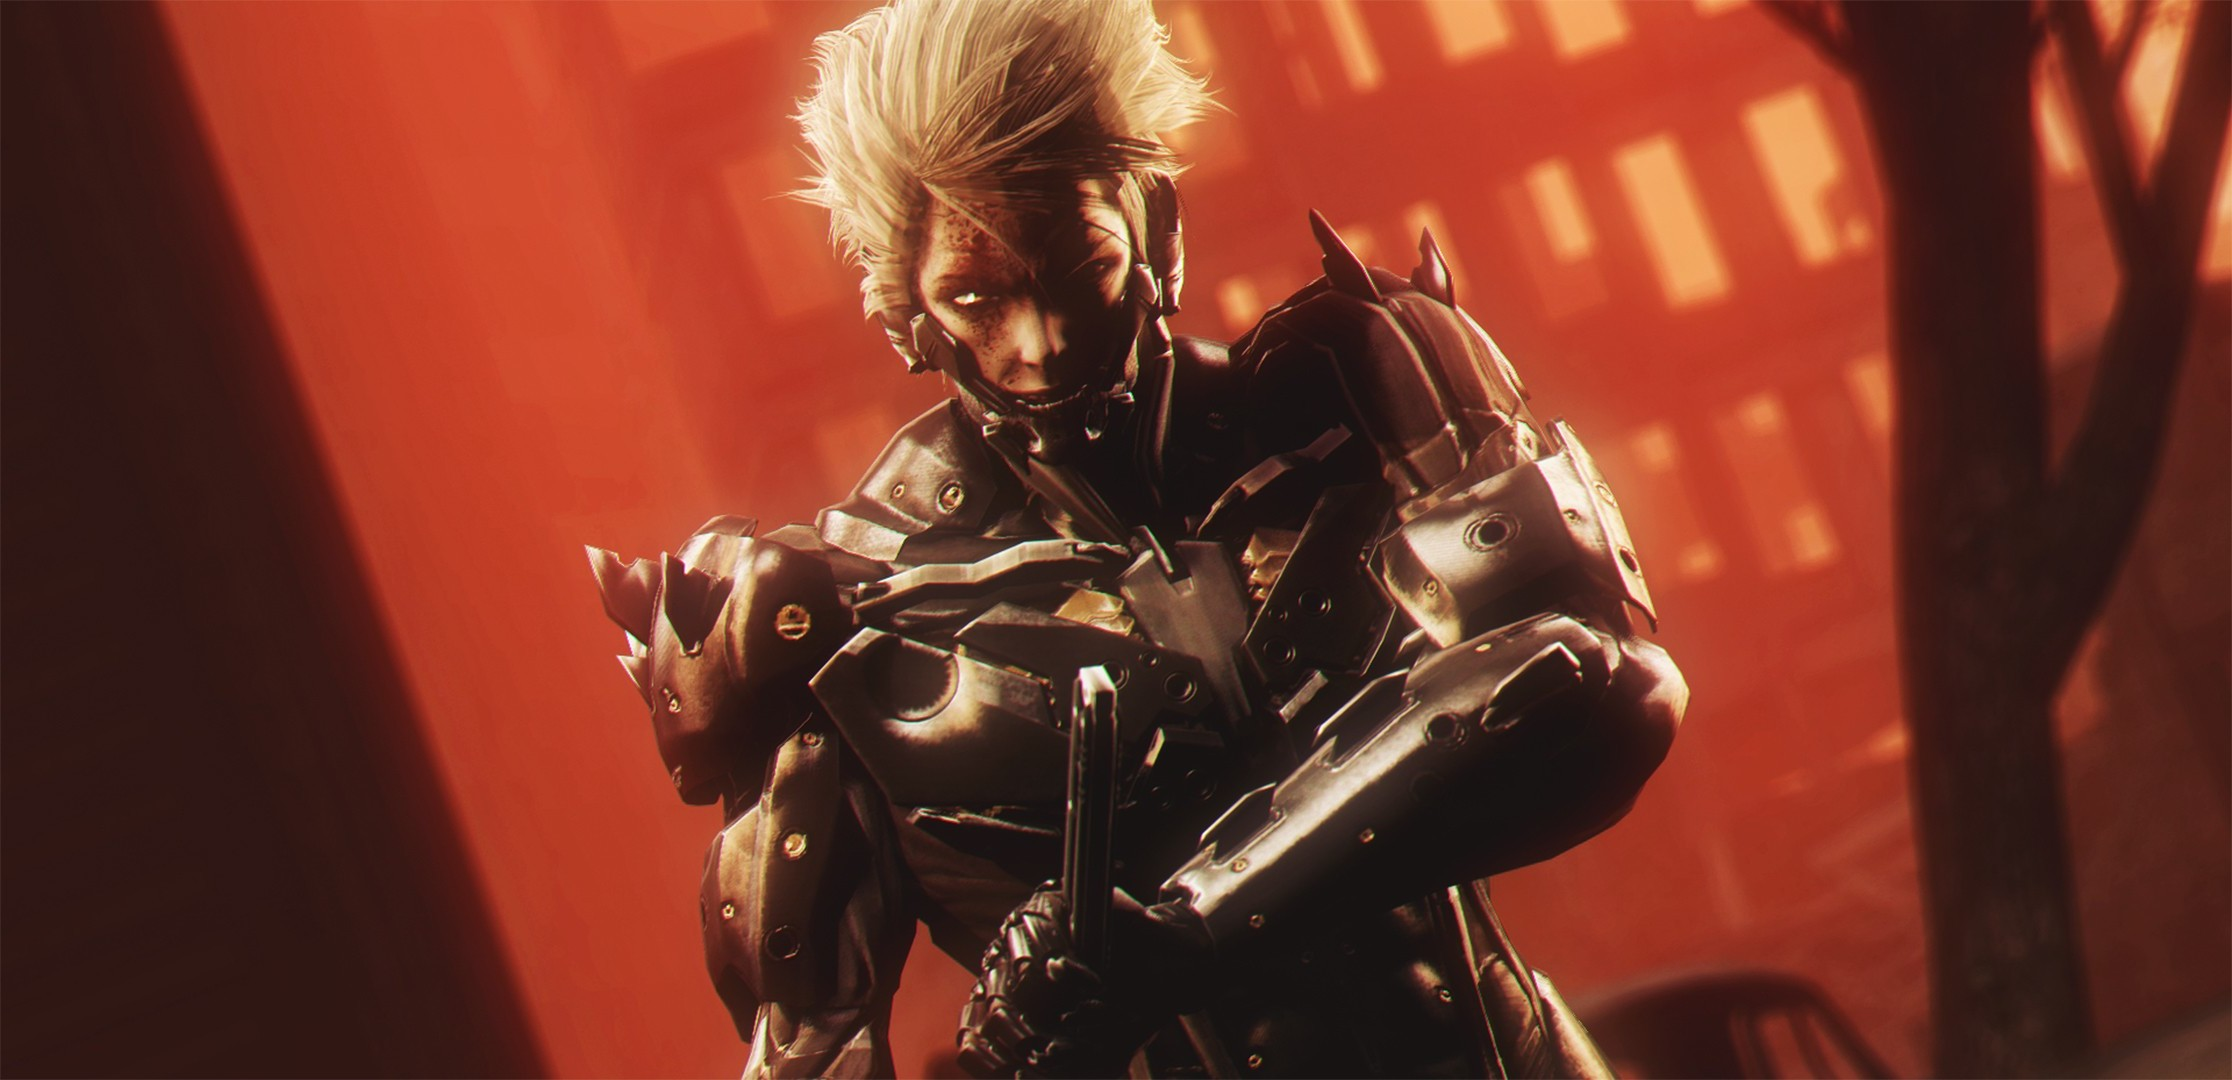 Video Games Artwork Metal Gear Rising Revengeance Wallpaper - Cg Artwork , HD Wallpaper & Backgrounds